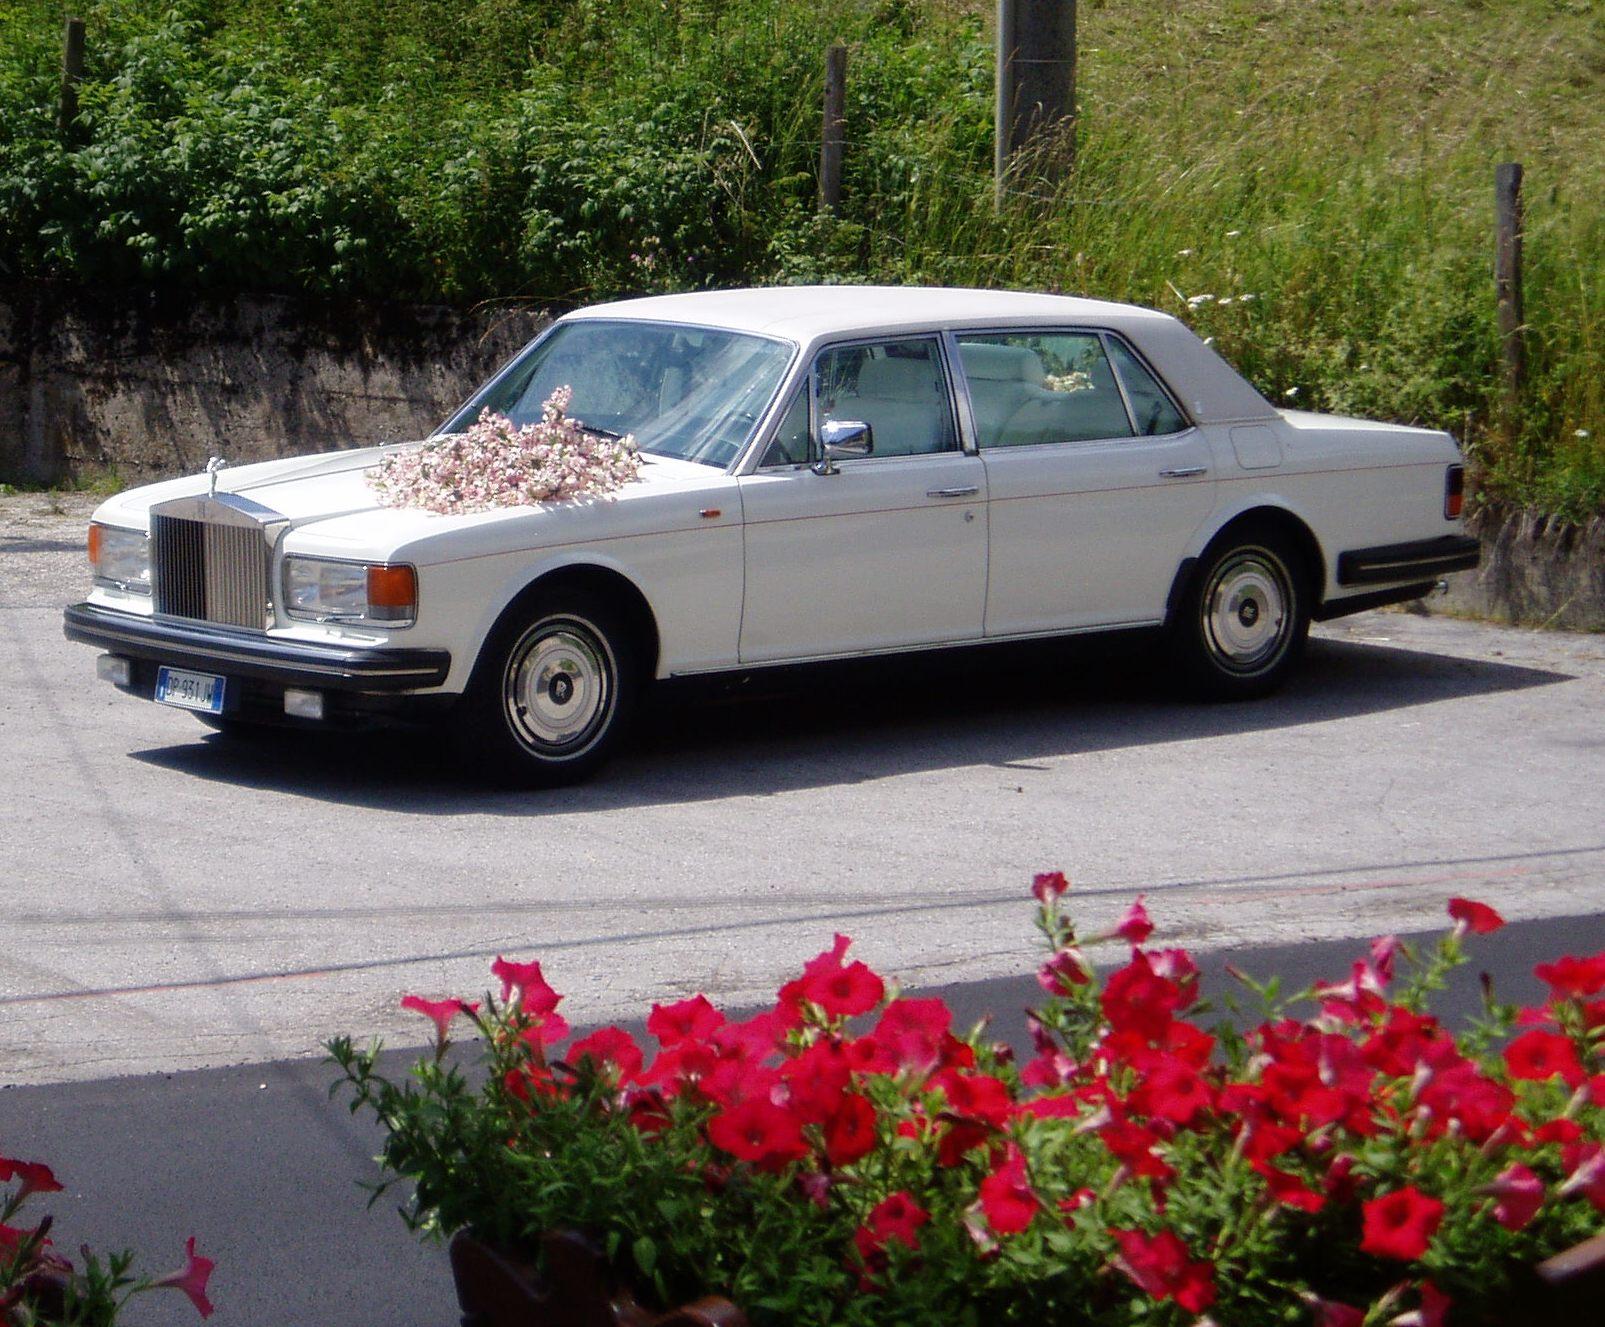 La nostra Rolls Royce d'epoca